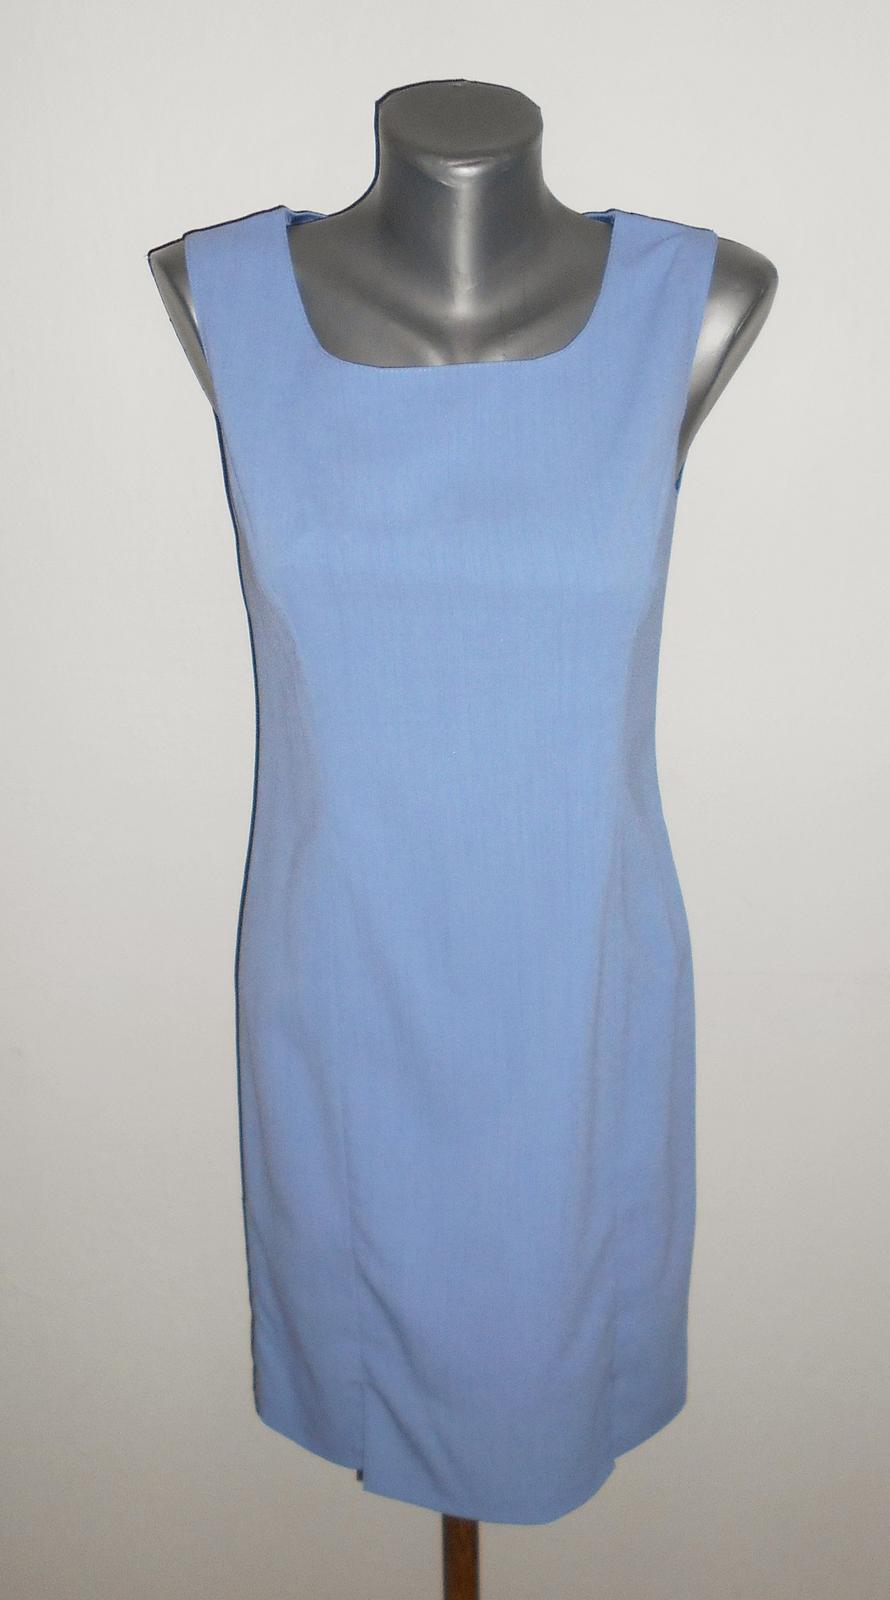 Sako, šaty a nohavice - Obrázok č. 2